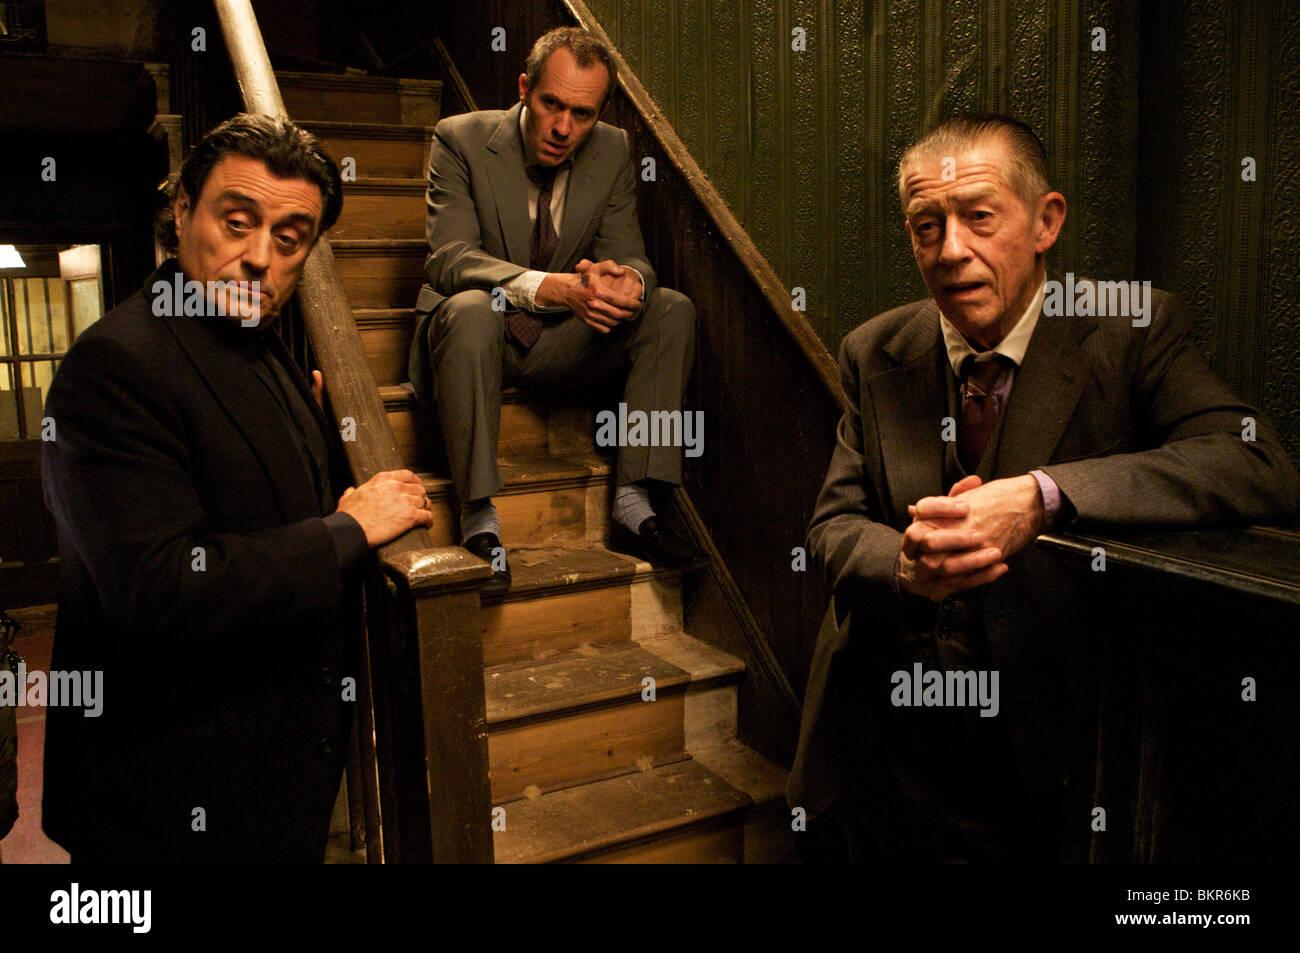 44 INCH CHEST (2009) MALCOLM VENVILLE (DIR) 004 - Stock Image